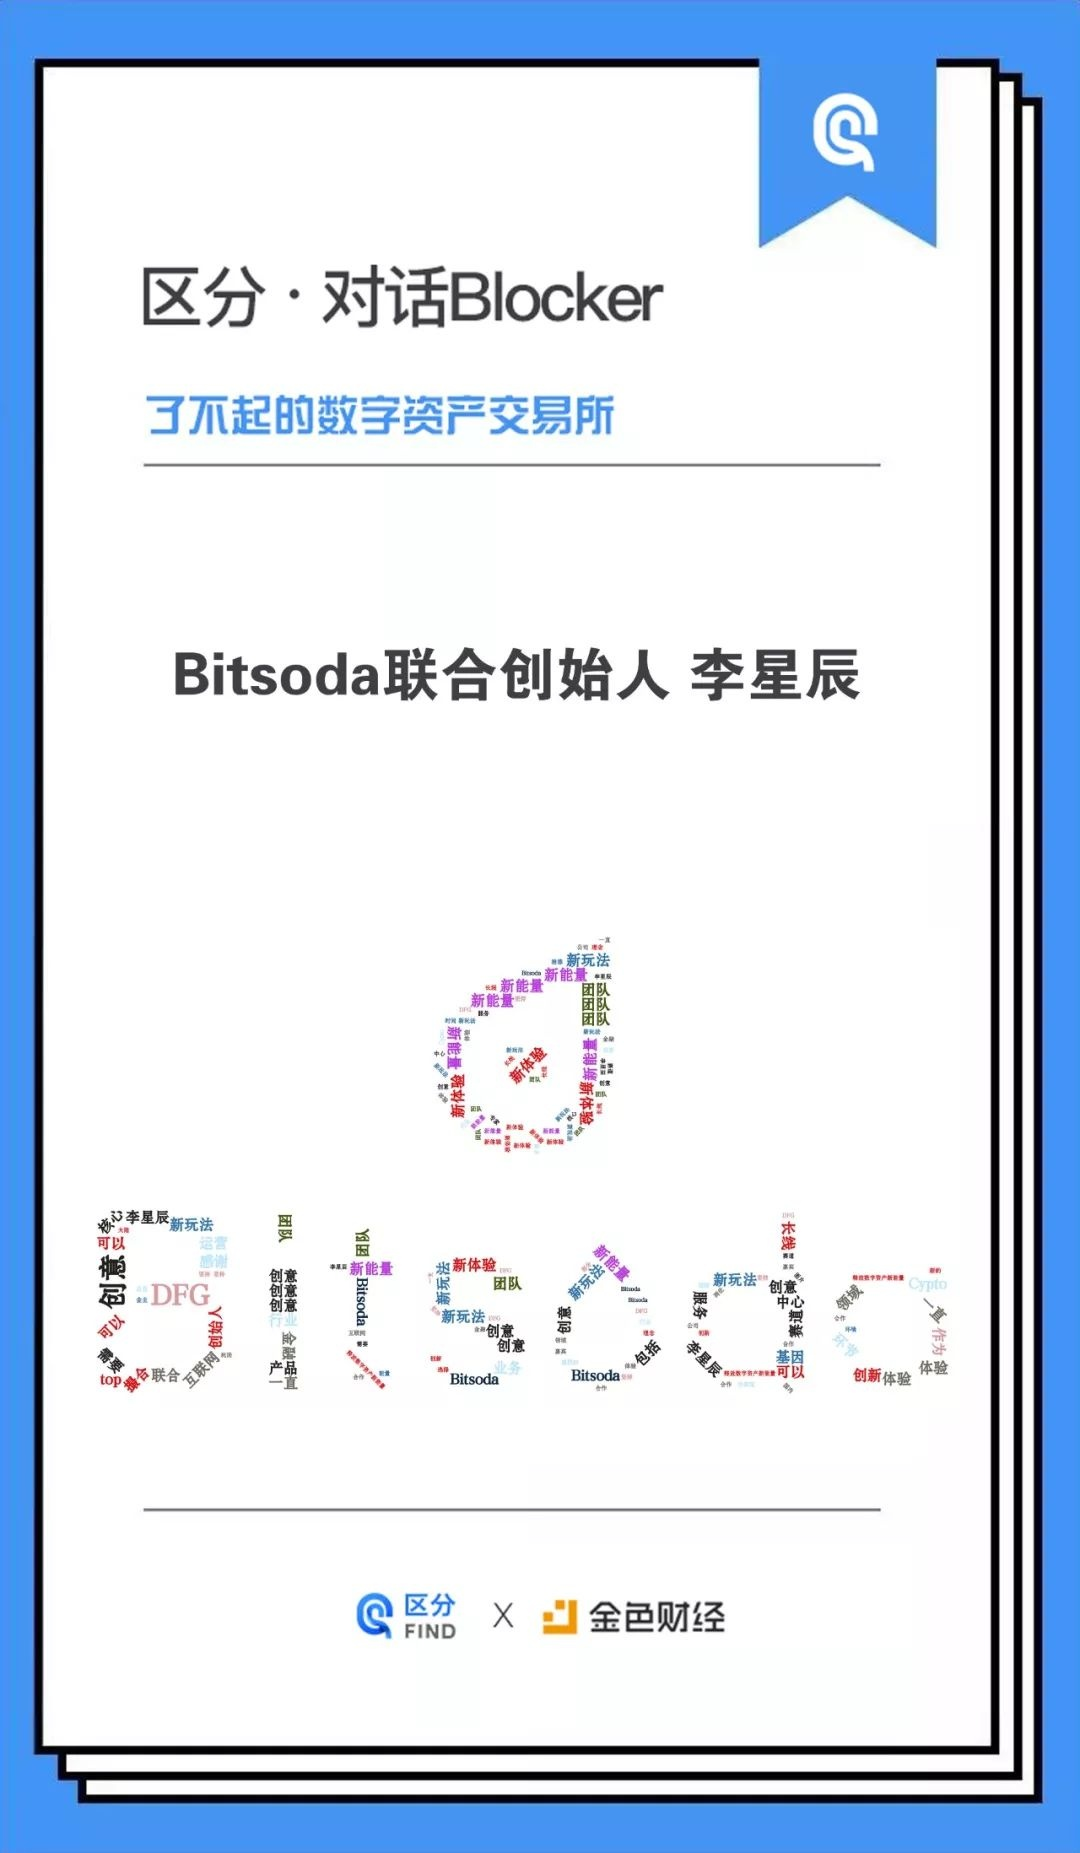 Bitsoda联合创始人李星辰: 释放数字资产新能量